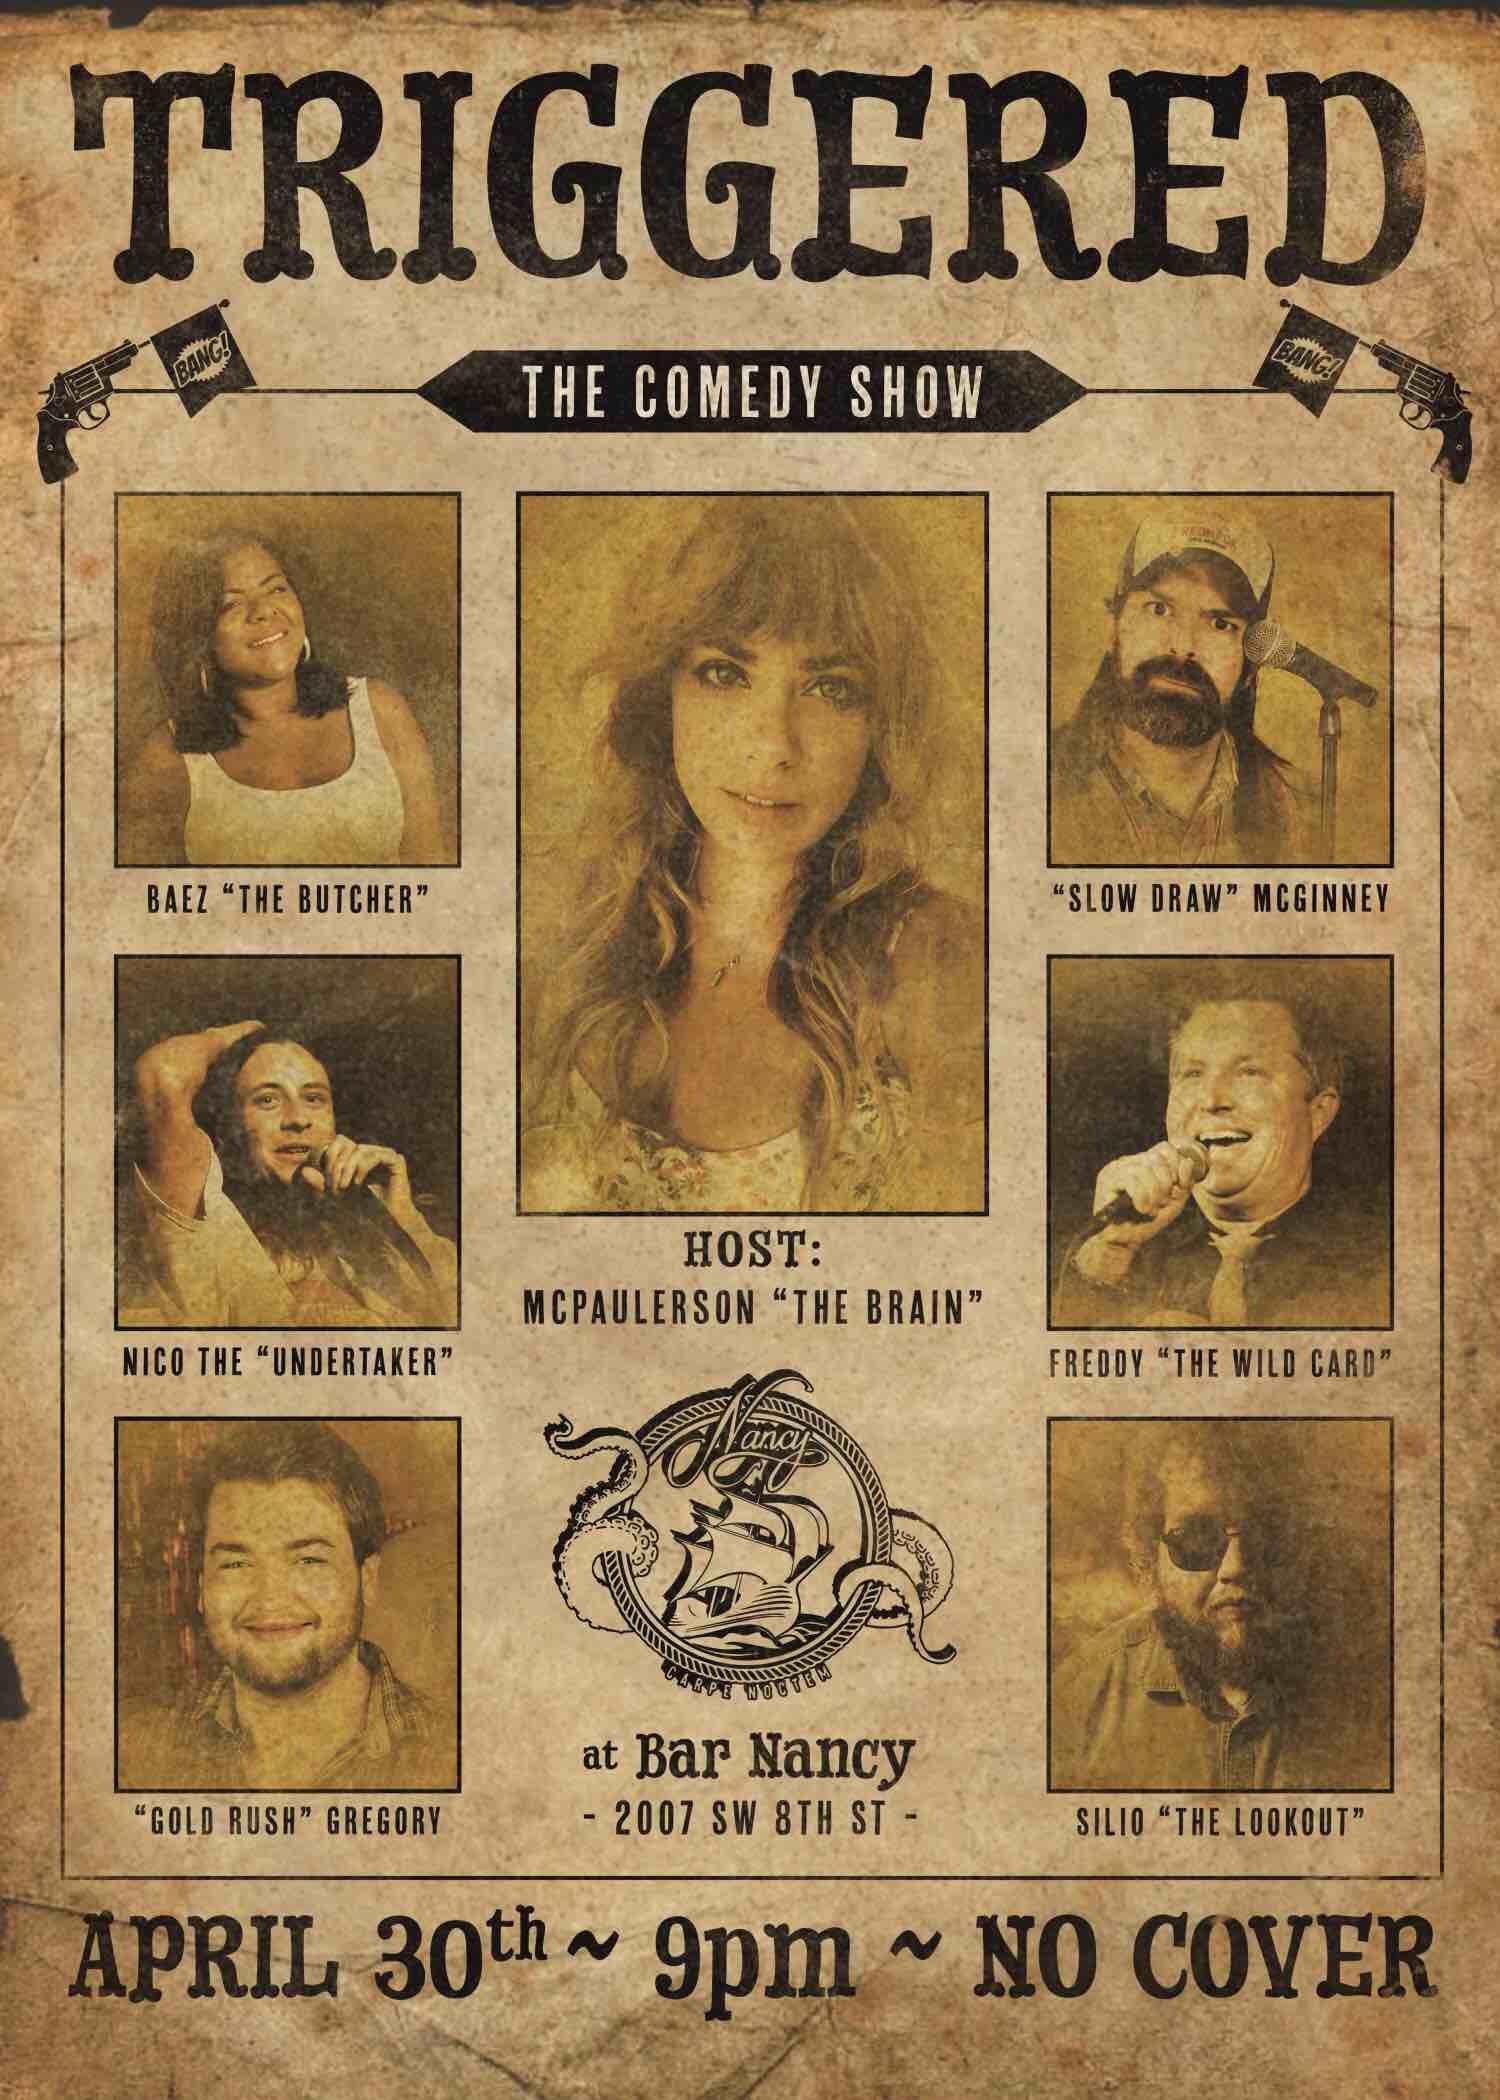 Triggered - The Comedy Show at Bar Nancy April 30 at 9pm